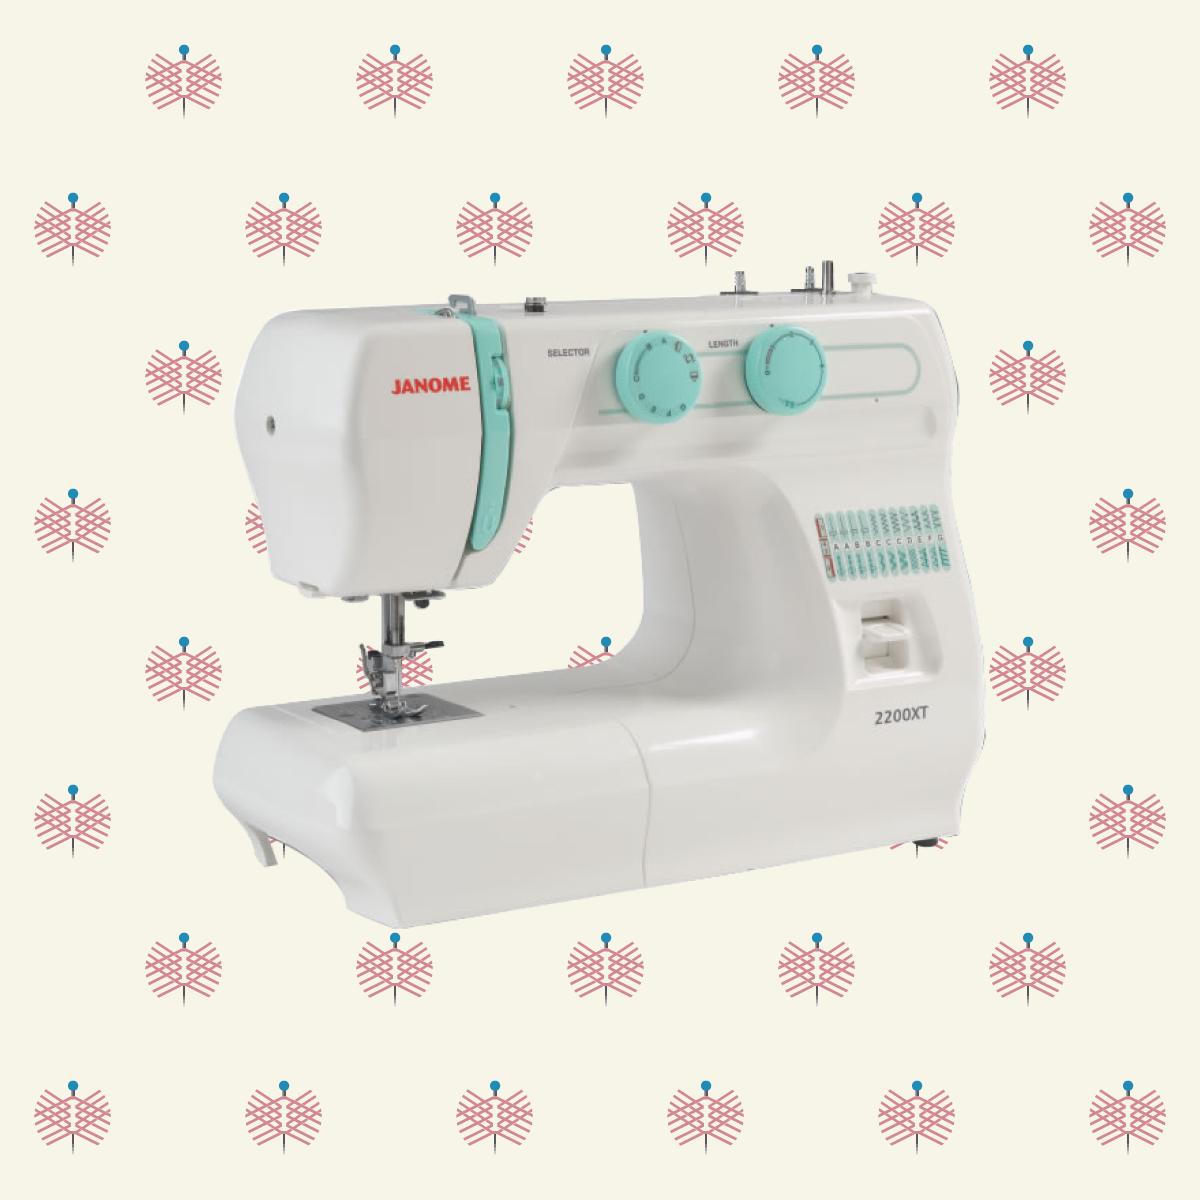 Janome 2200XT Sewing Machine | Sewing machine, Sewing, Janome